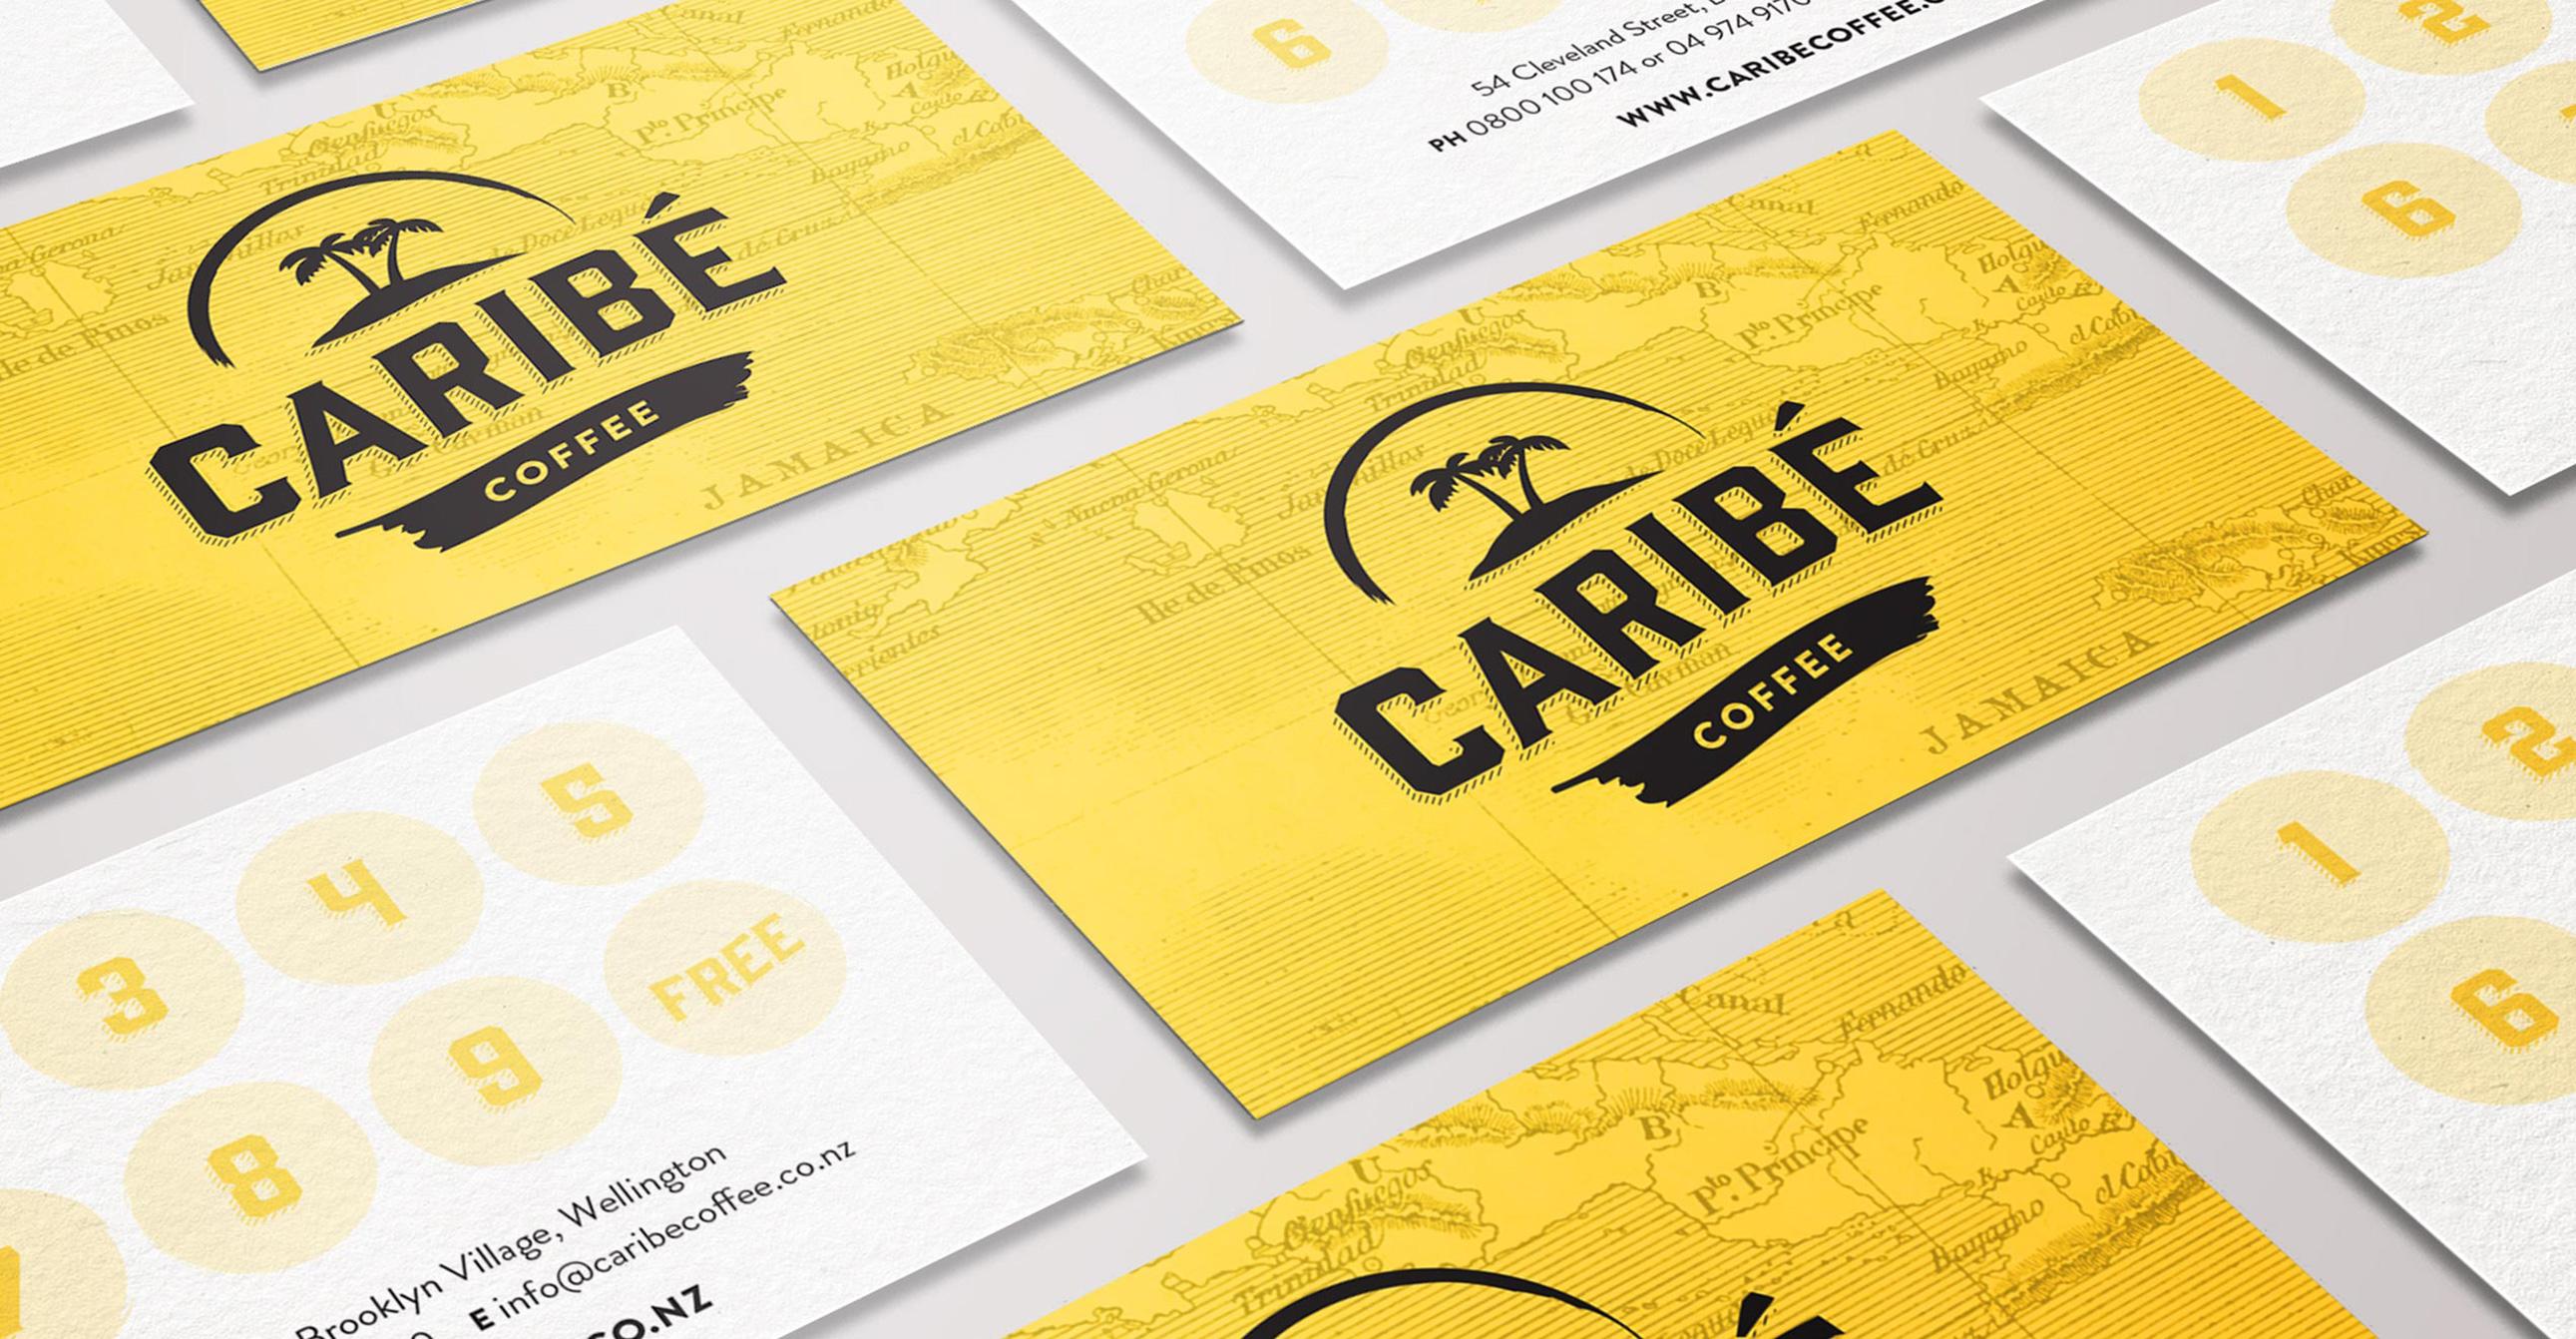 caribe_4_test.jpg